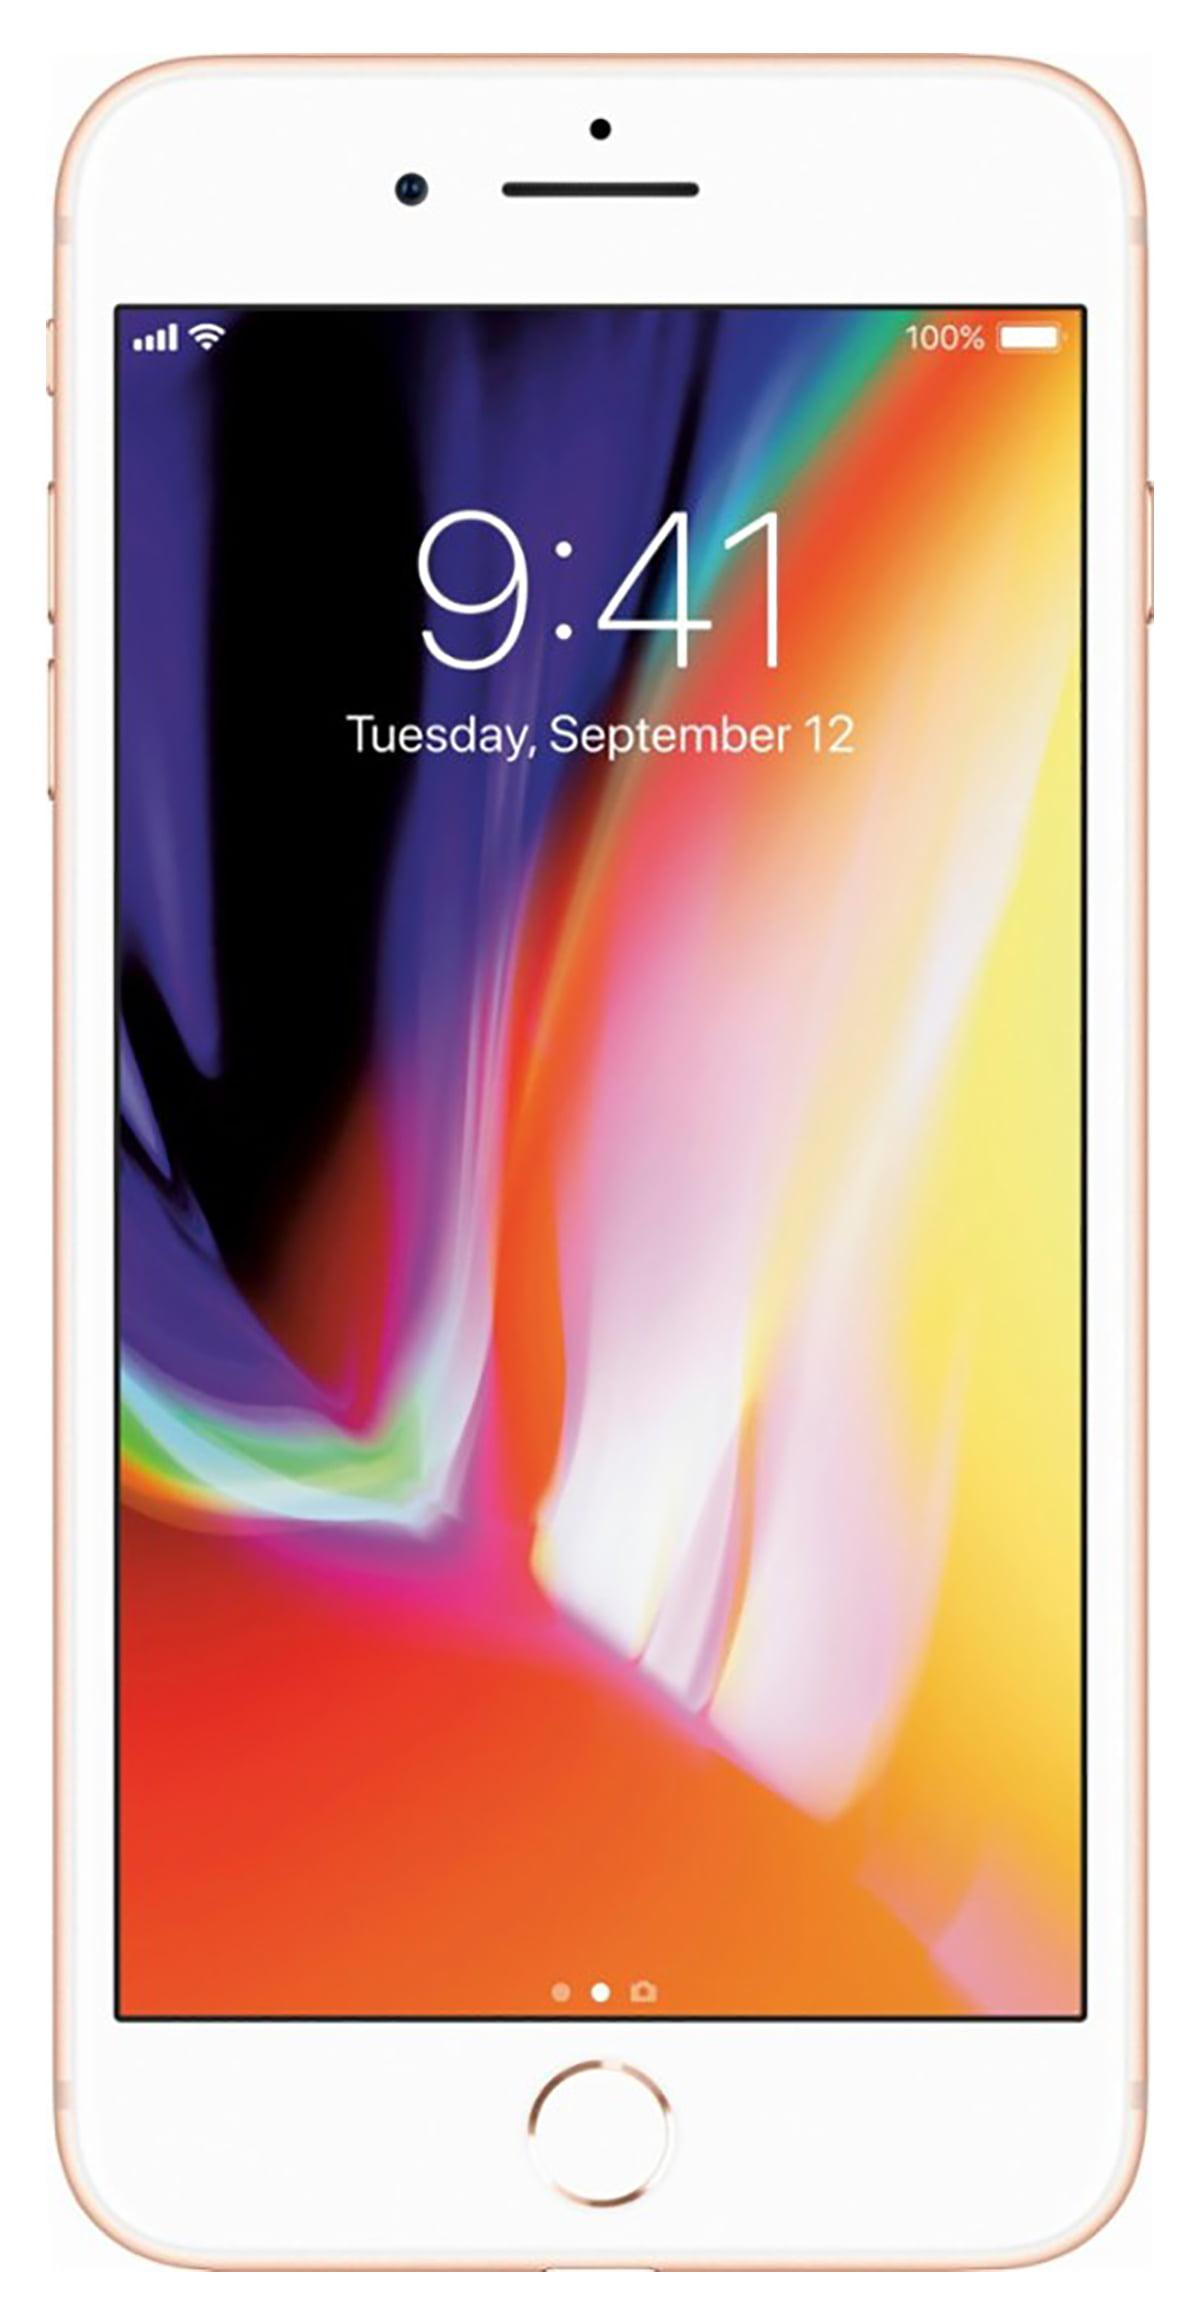 Apple iPhone 8 Plus 256GB Unlocked GSM CDMA Phone w  12MP Camera Gold by Apple